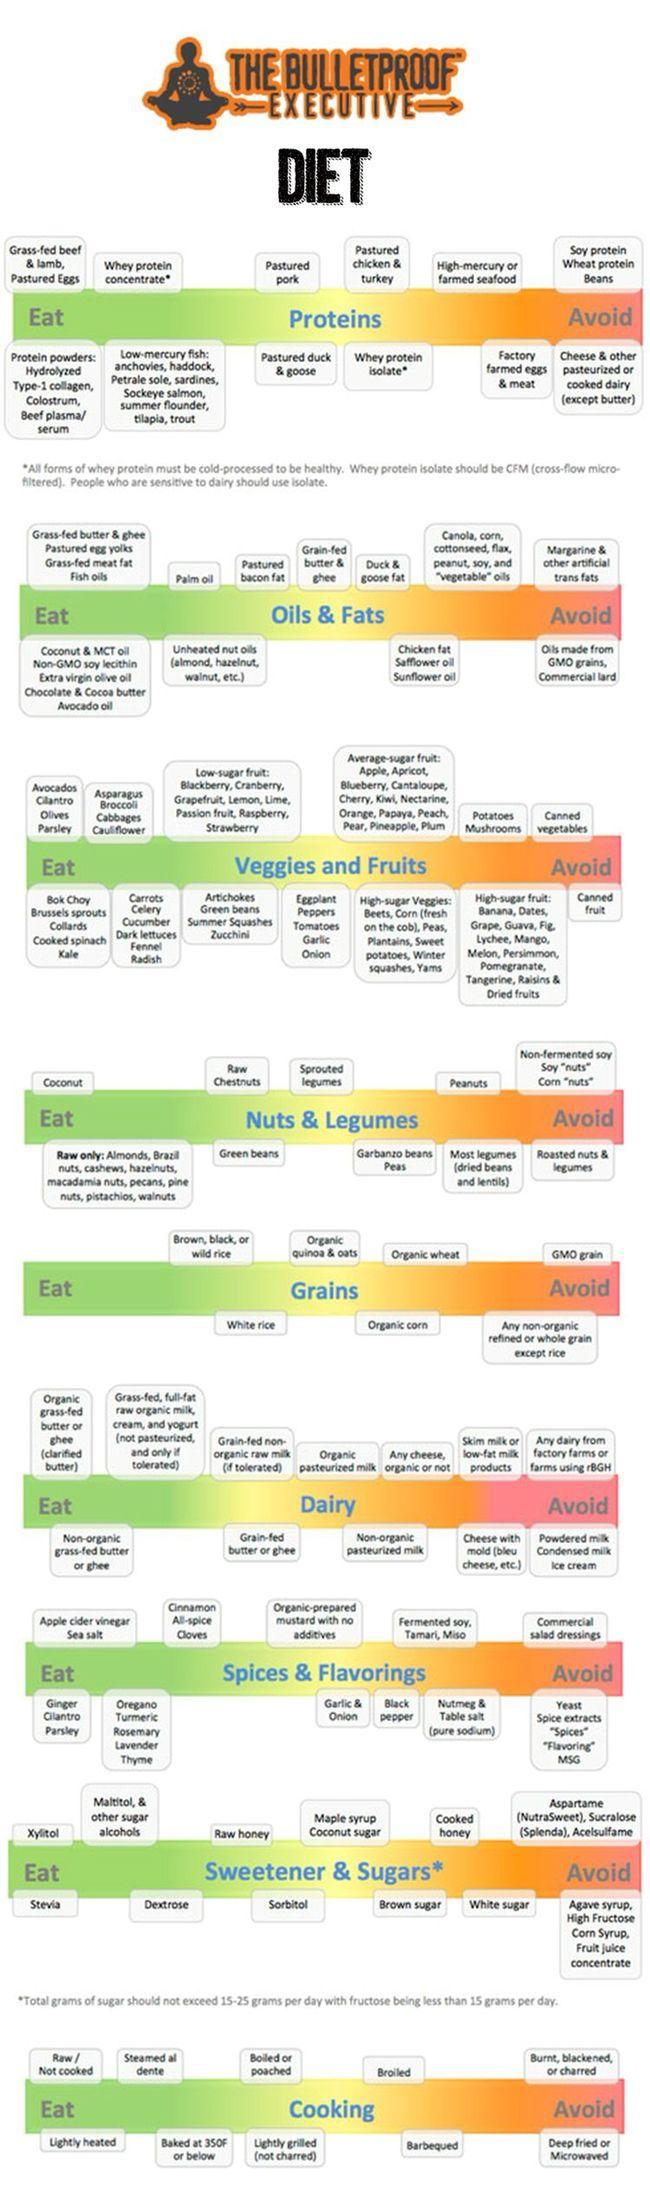 Bulletproof Diet chart